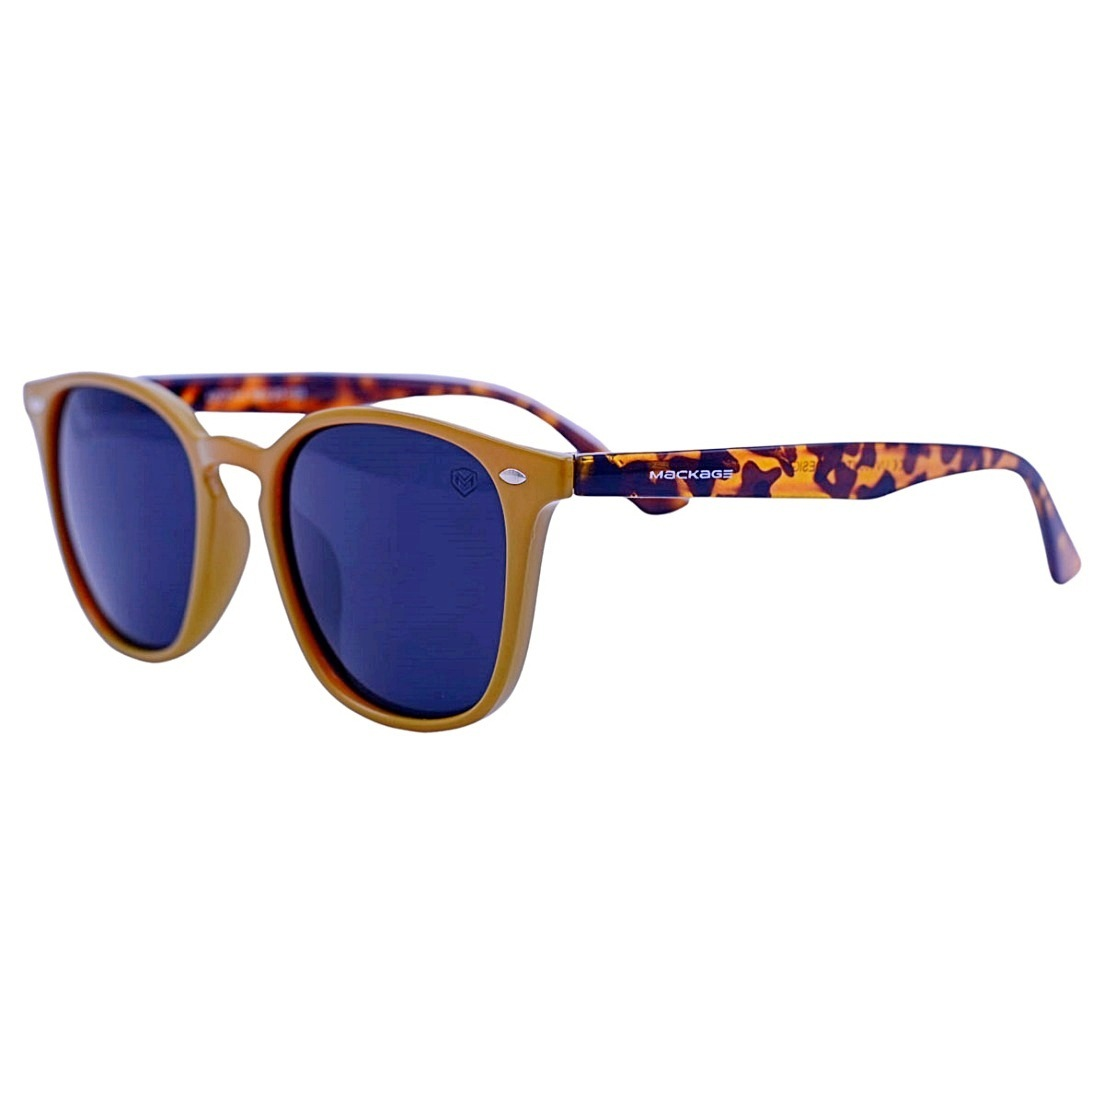 Óculos De Sol Mackage Unissex Acetato Quadrado Wayfarer - Mostarda/Tartaruga